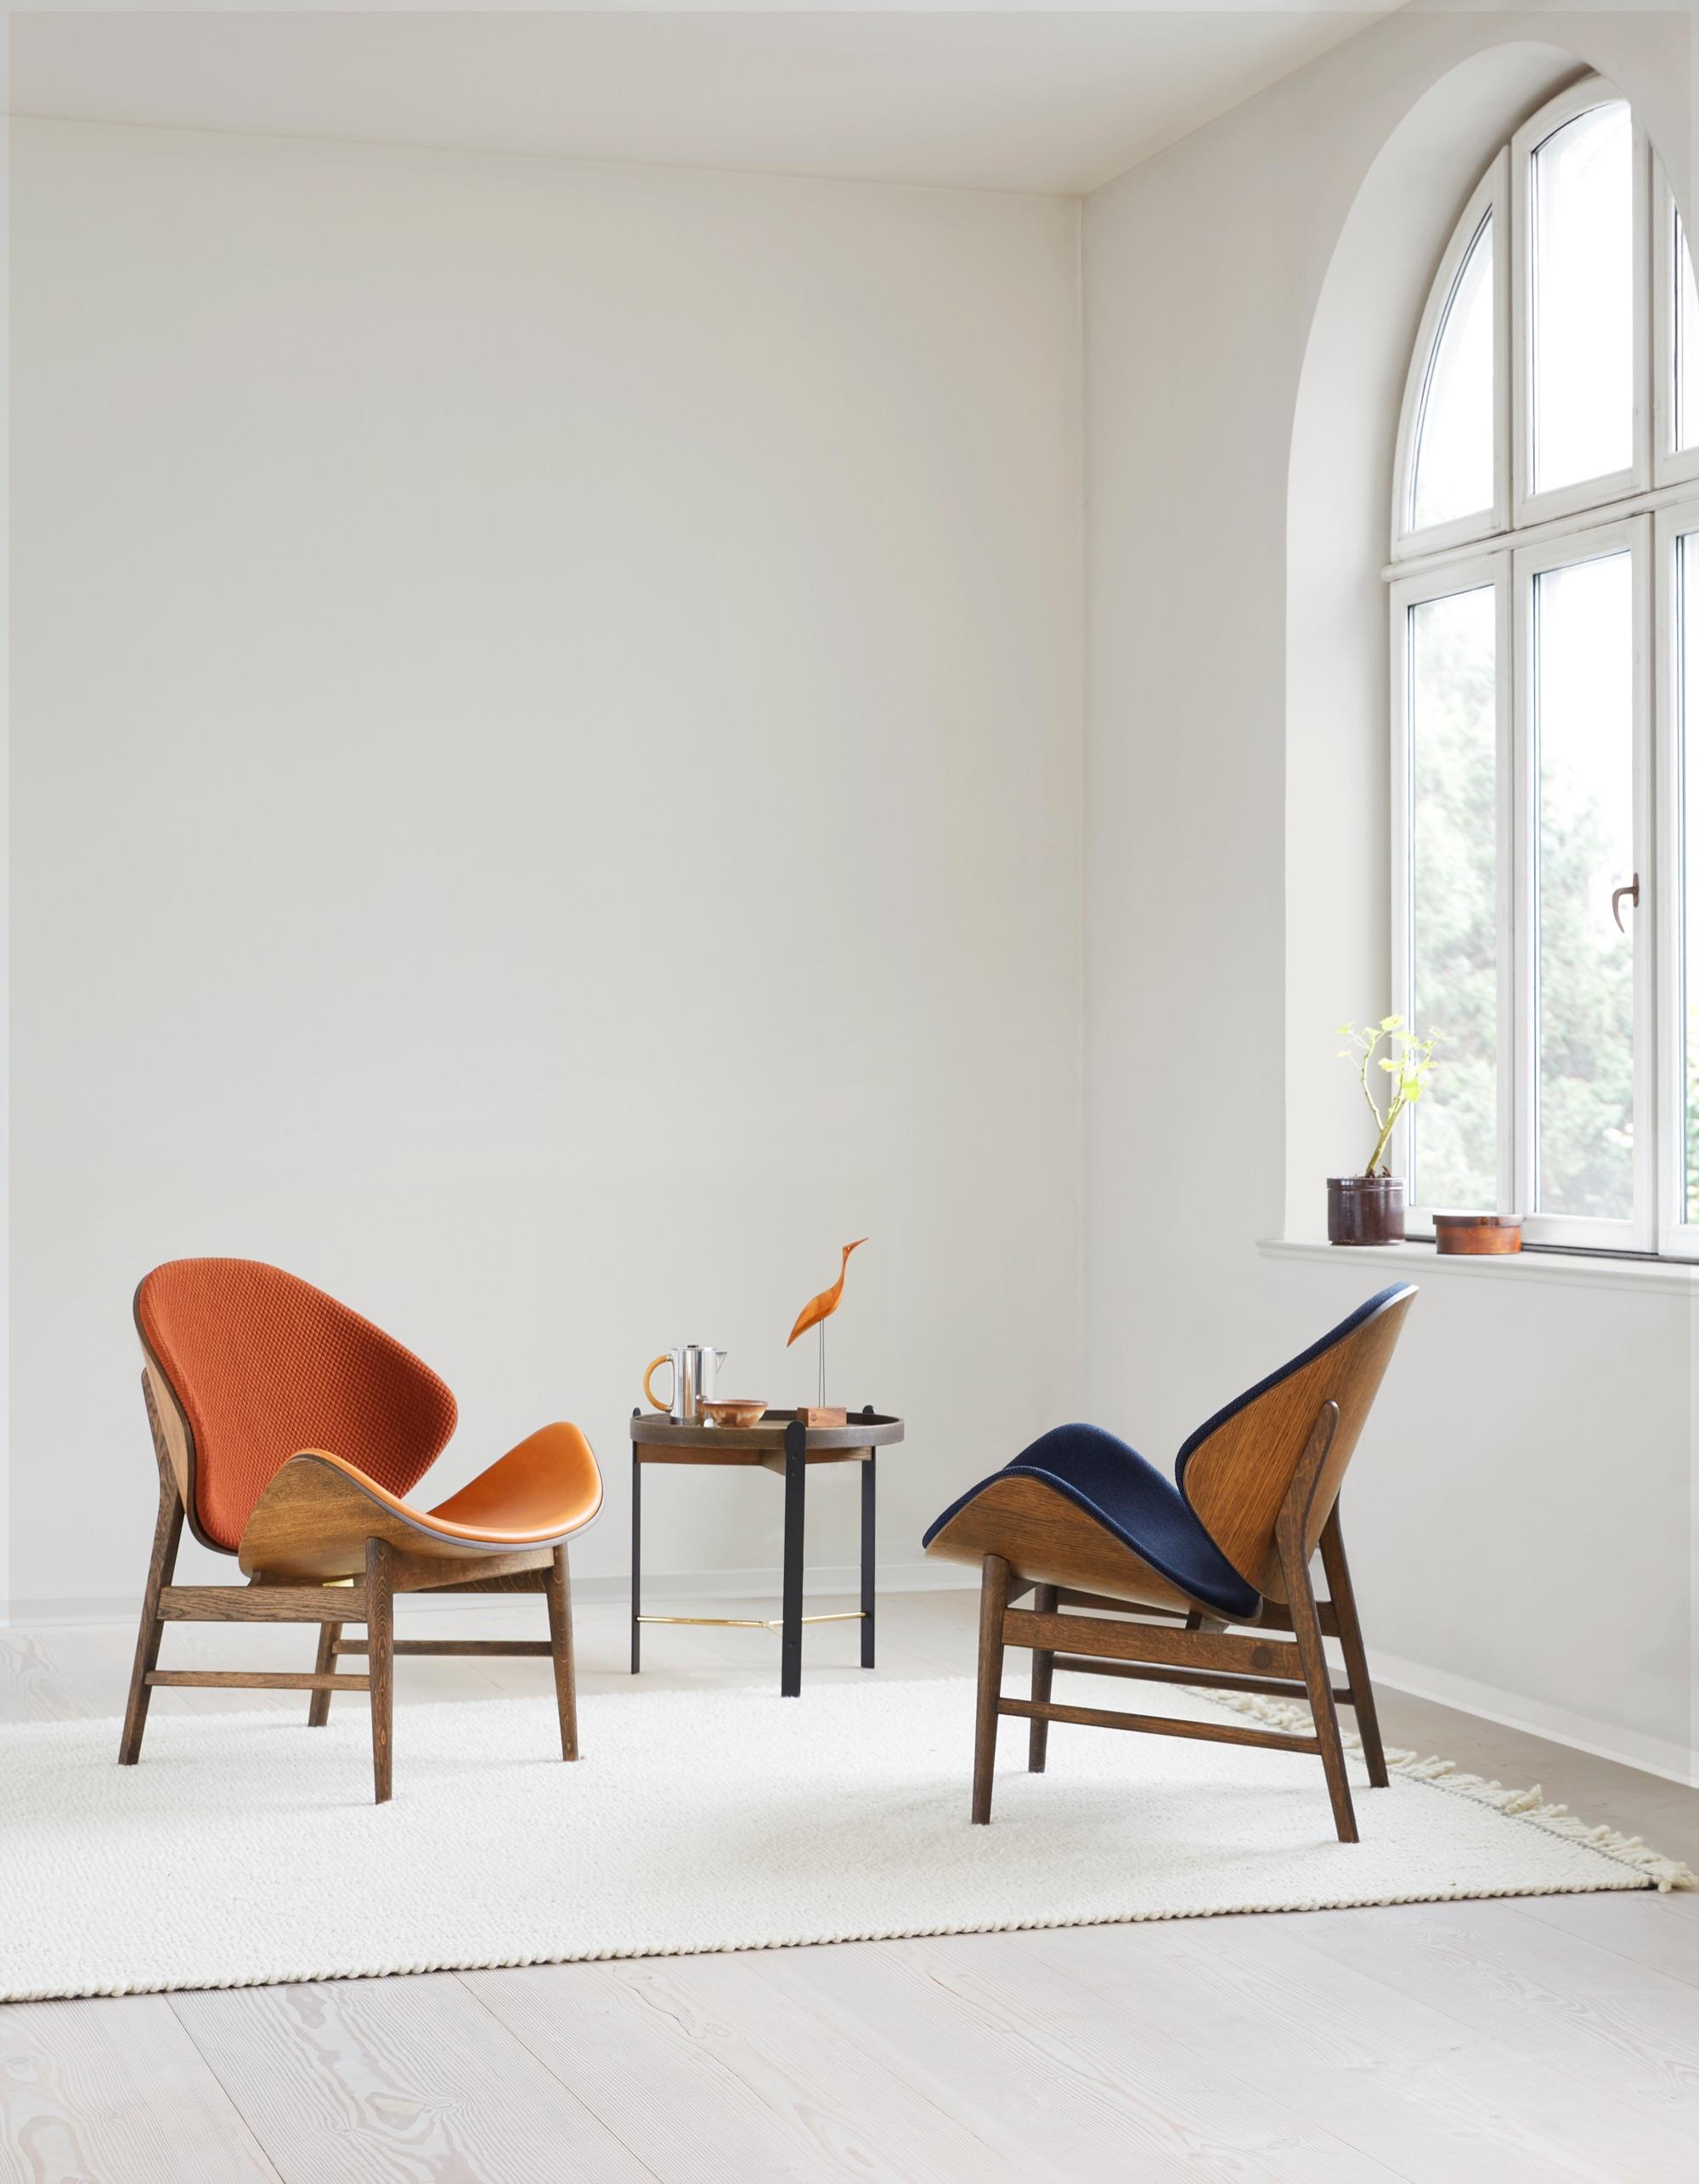 Modernism loves plywood